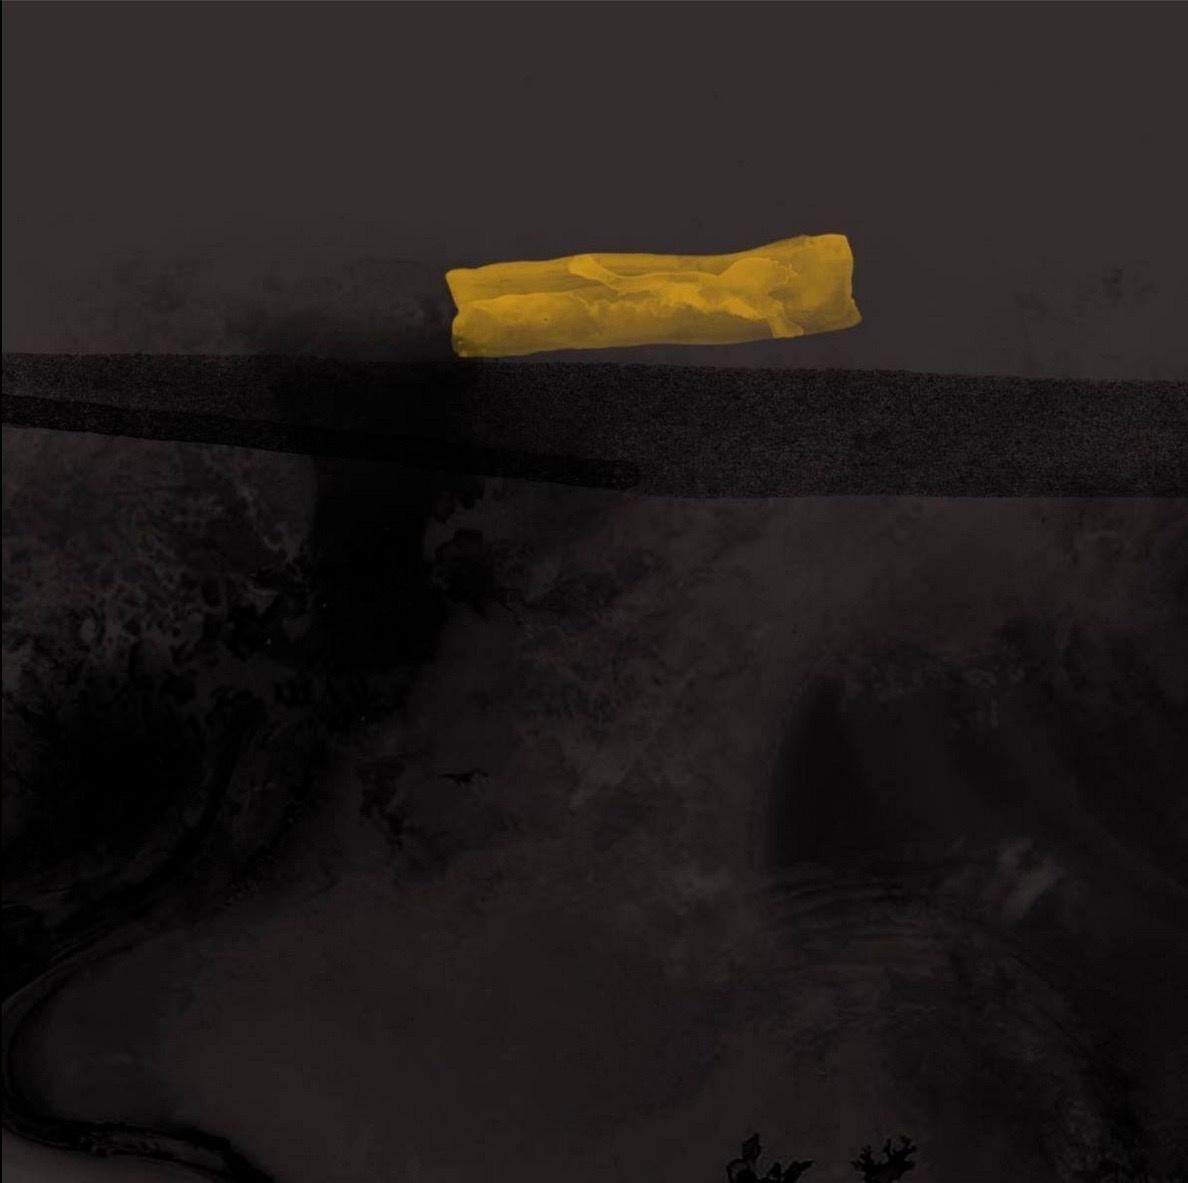 chasing yellow by Alan Spazzali